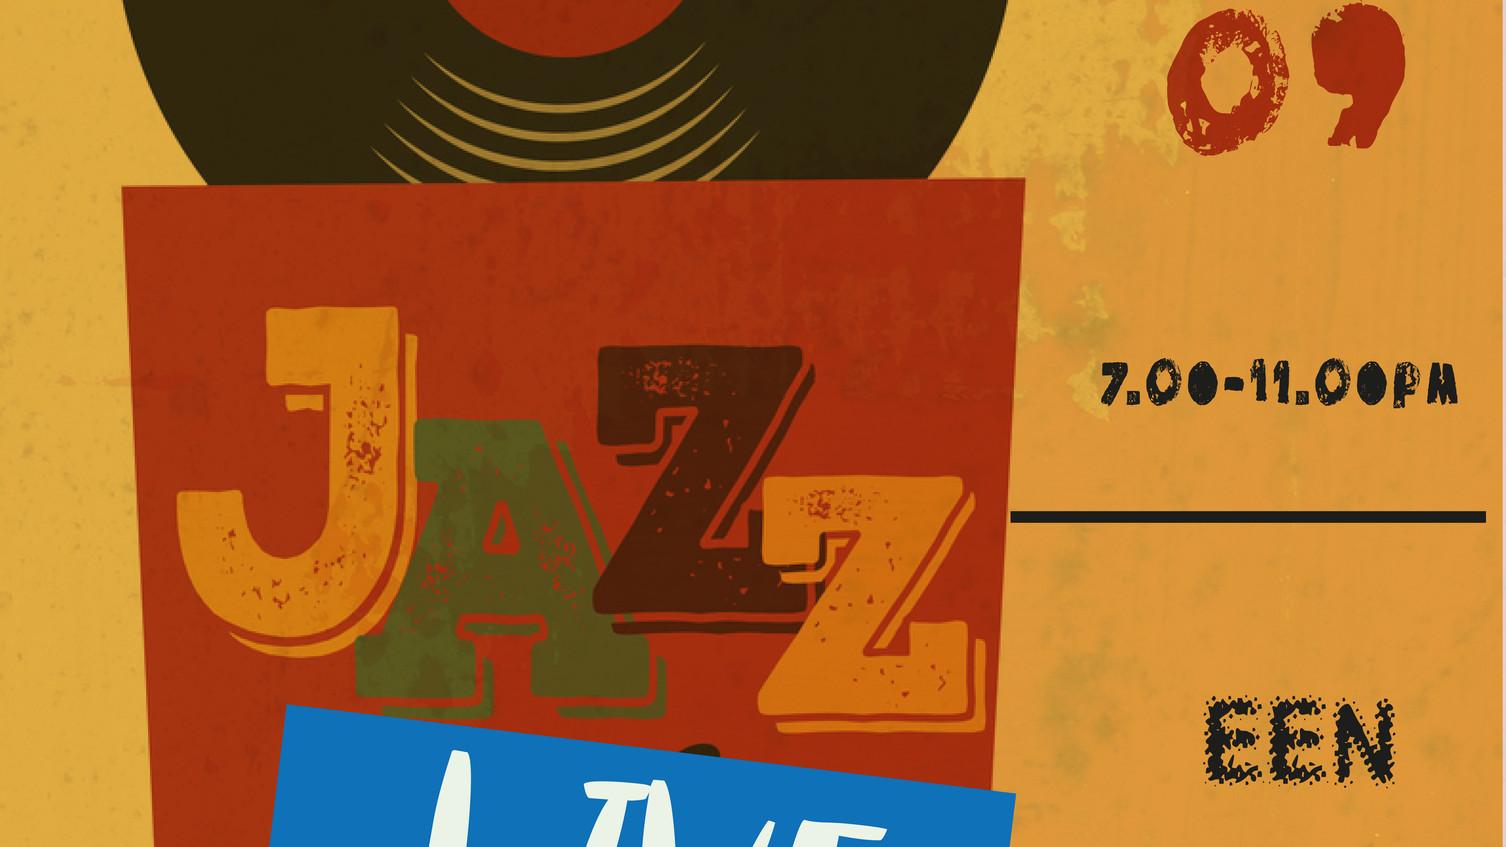 Amsterdam Jazz poster.jpg